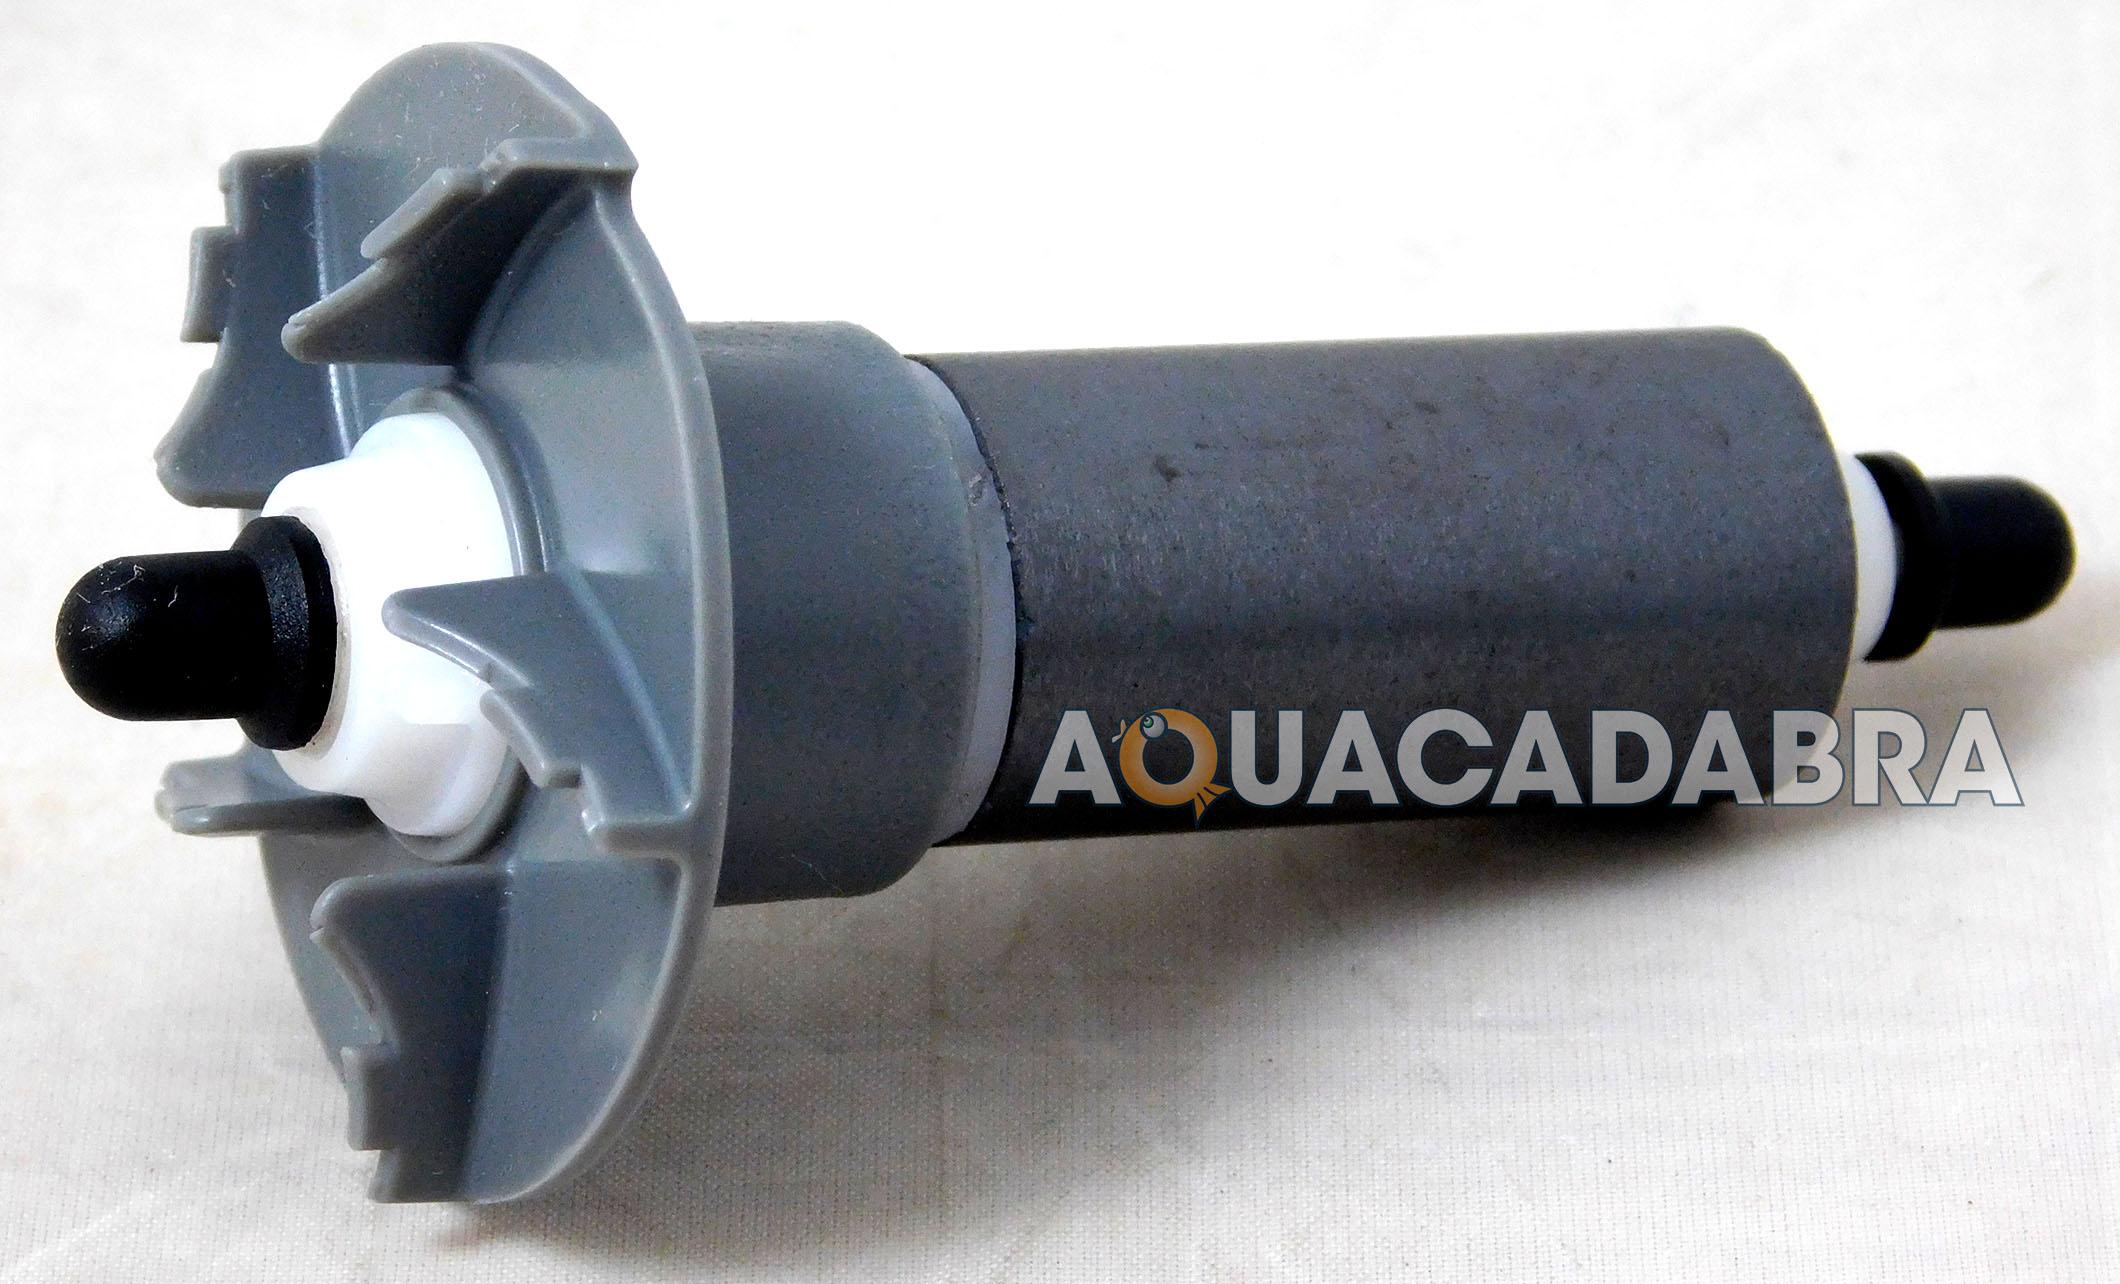 Hozelock easyclear 6000 impeller pond fish filter pump for Hozelock pond pumps